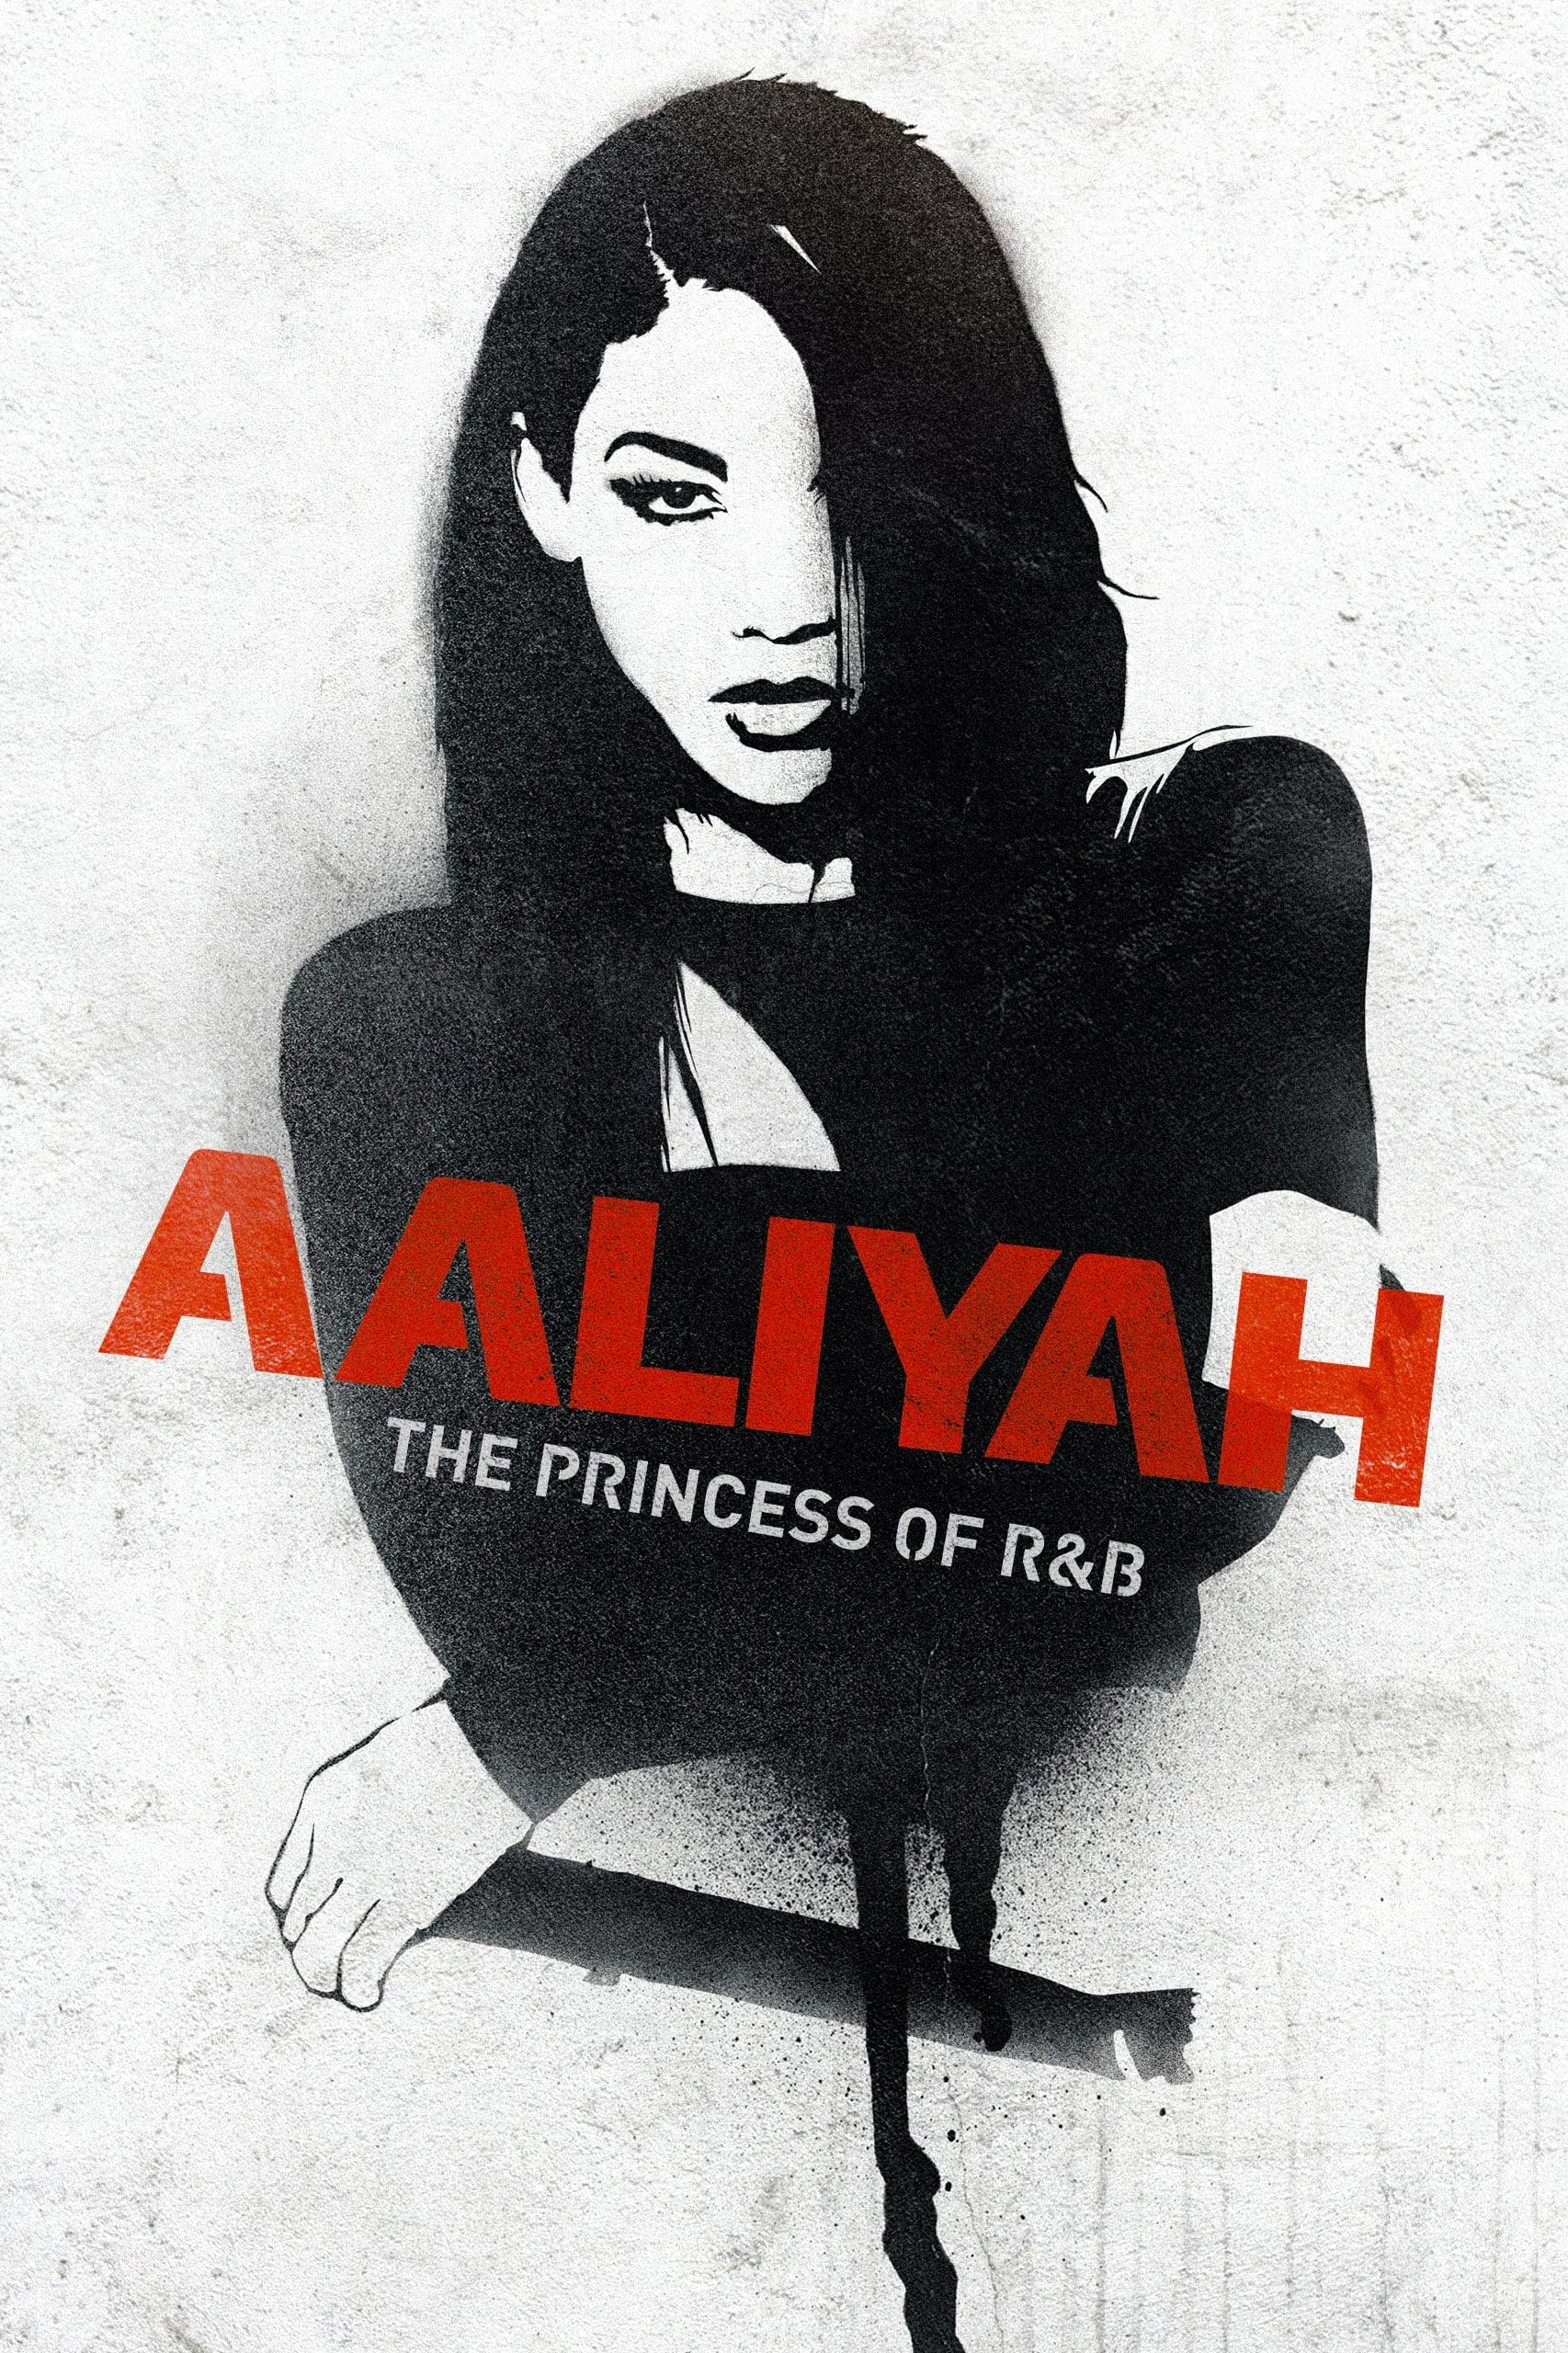 Aaliyah: Princesa do R&B